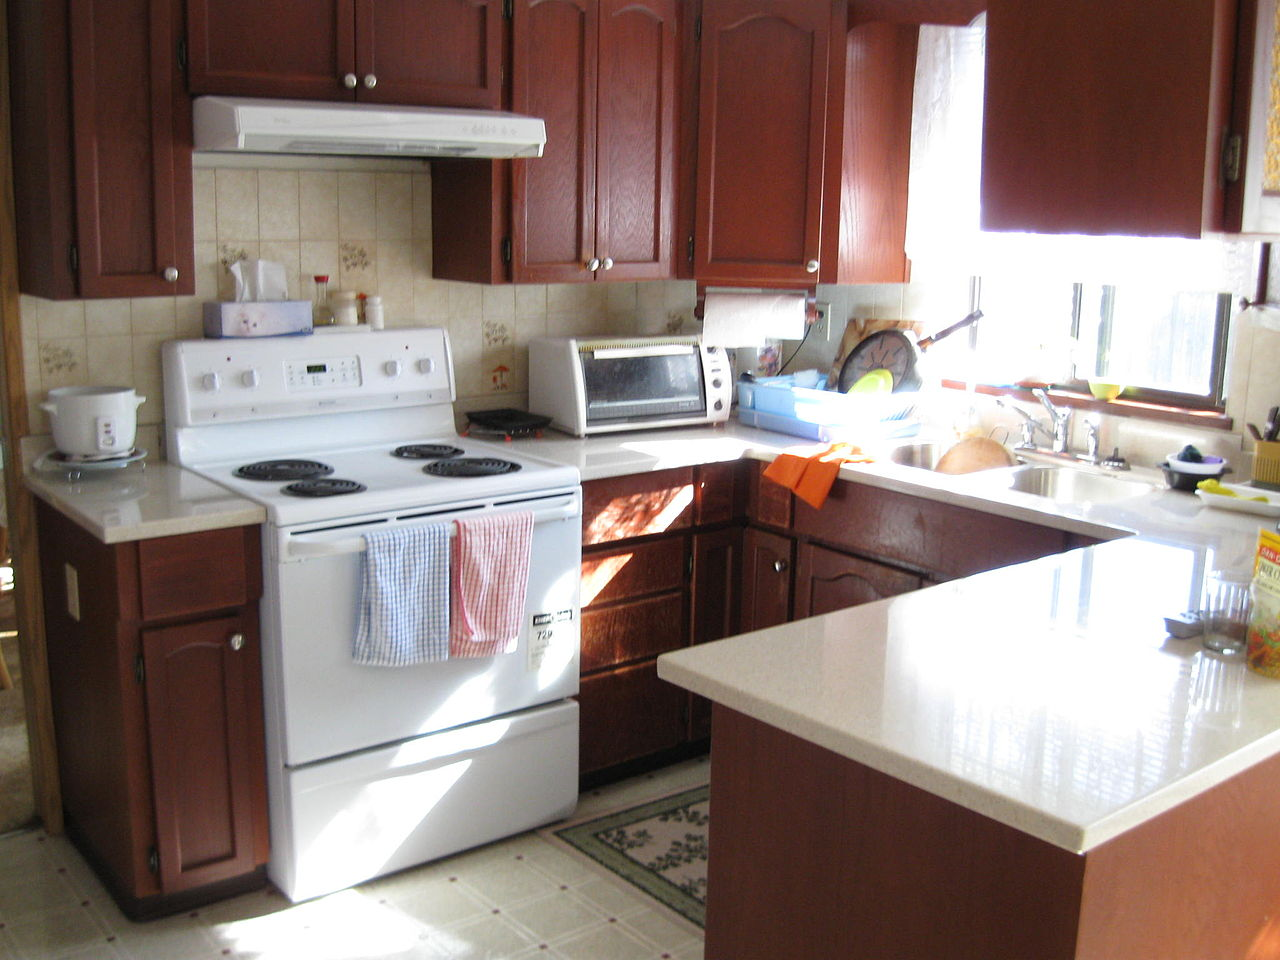 File:Humble kitchen08 corian kitchen countertops File Humble kitchen08